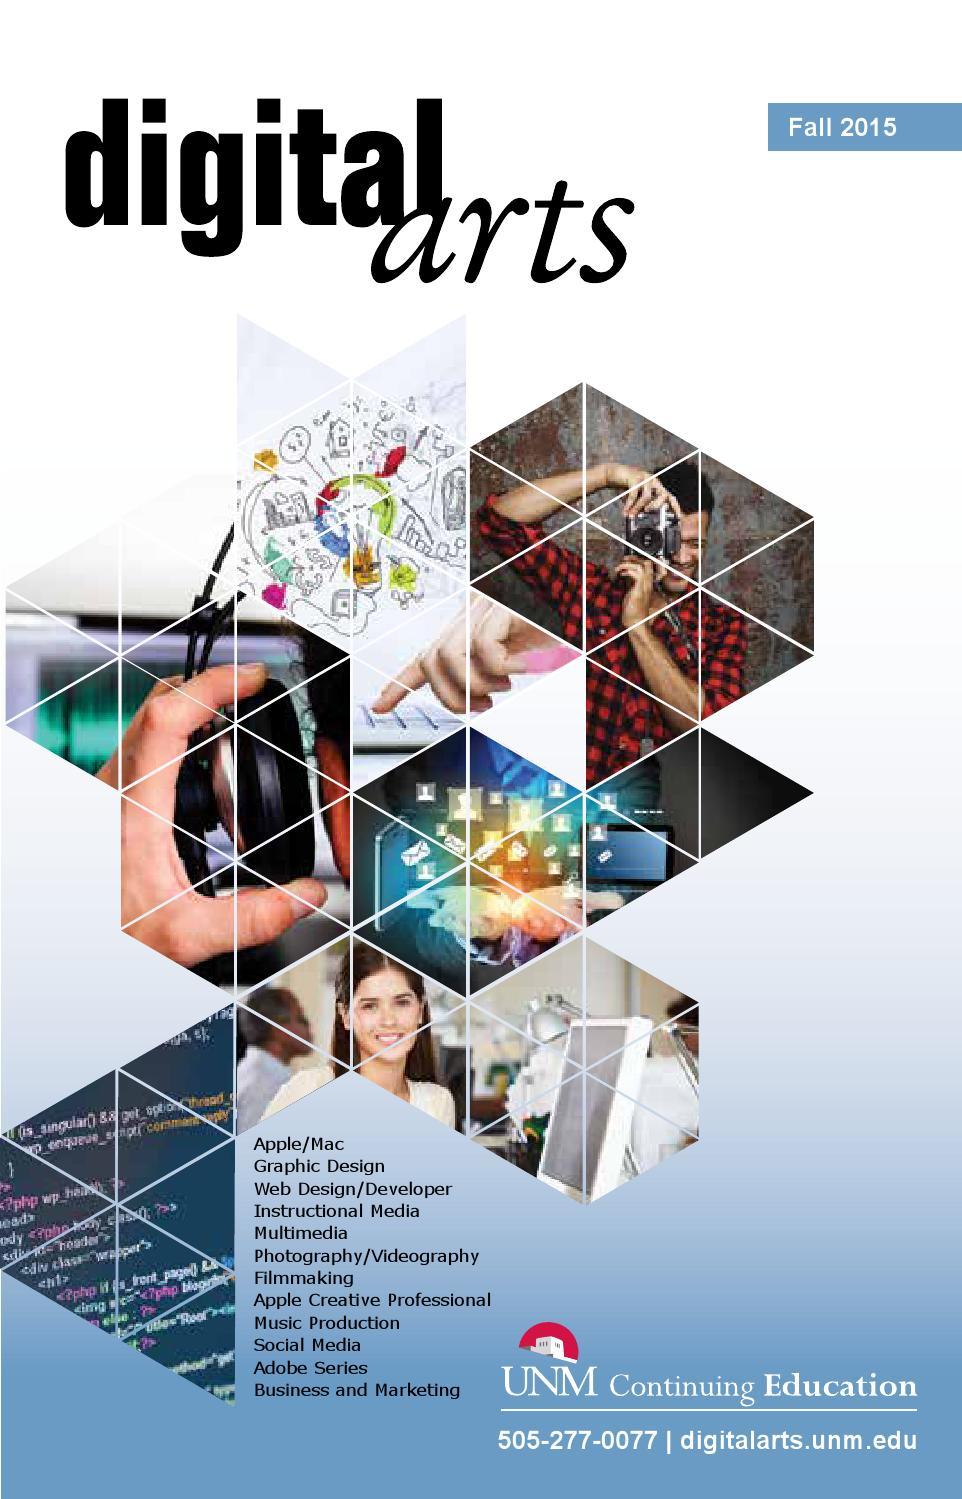 Digital Arts Fall 2015 Catalog Unm Continuing Education By Unm Continuing Education Issuu